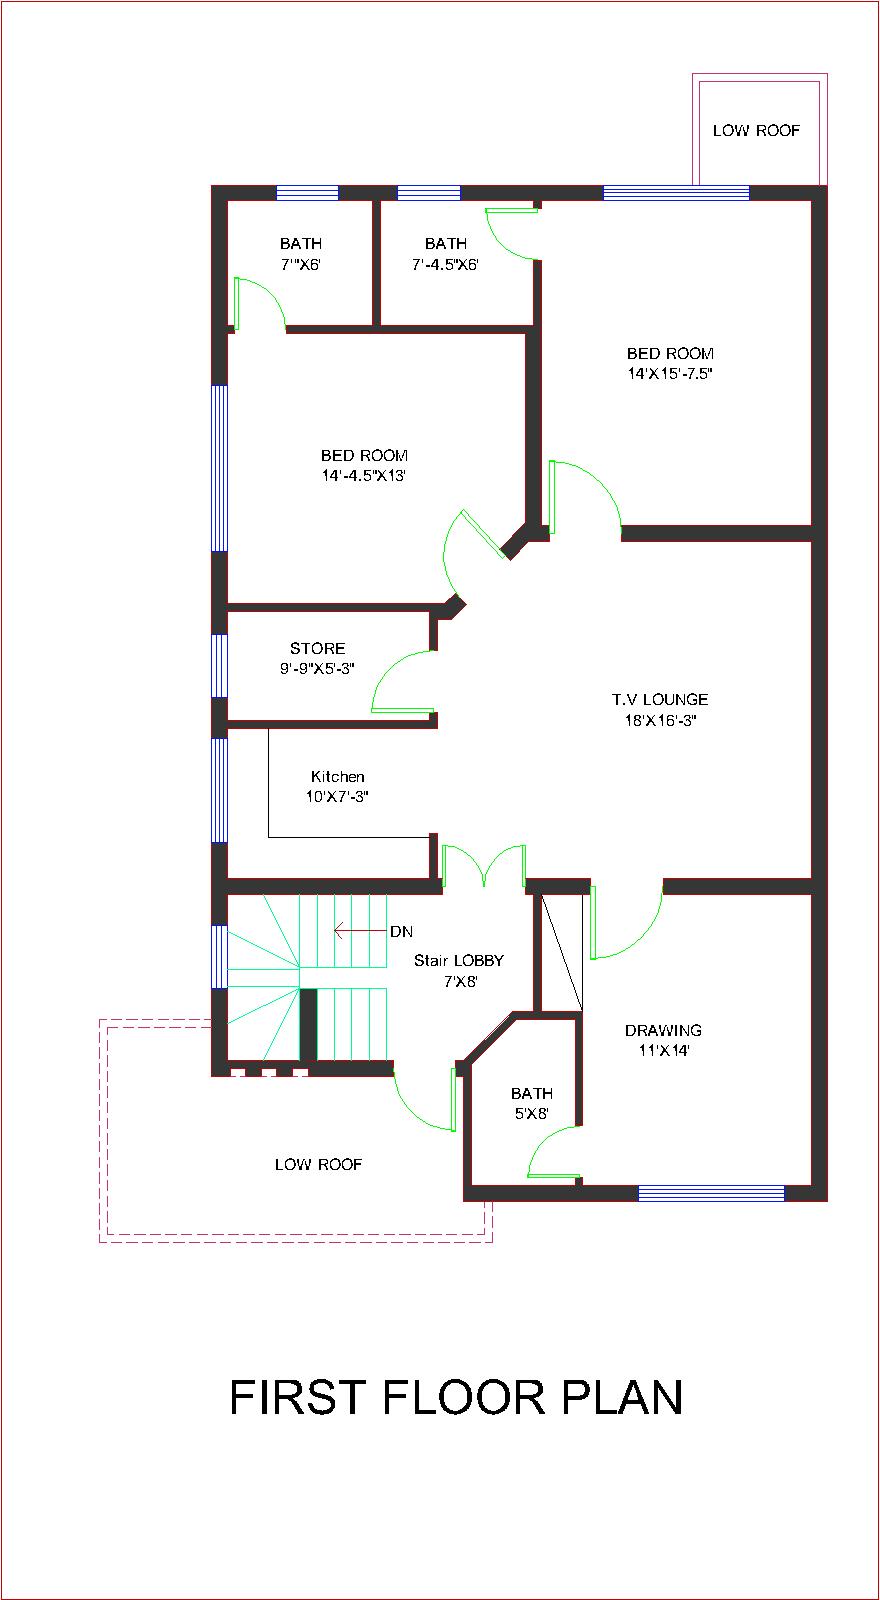 Pakistan 2014 new 10 marla house plan bahria town overseas b block